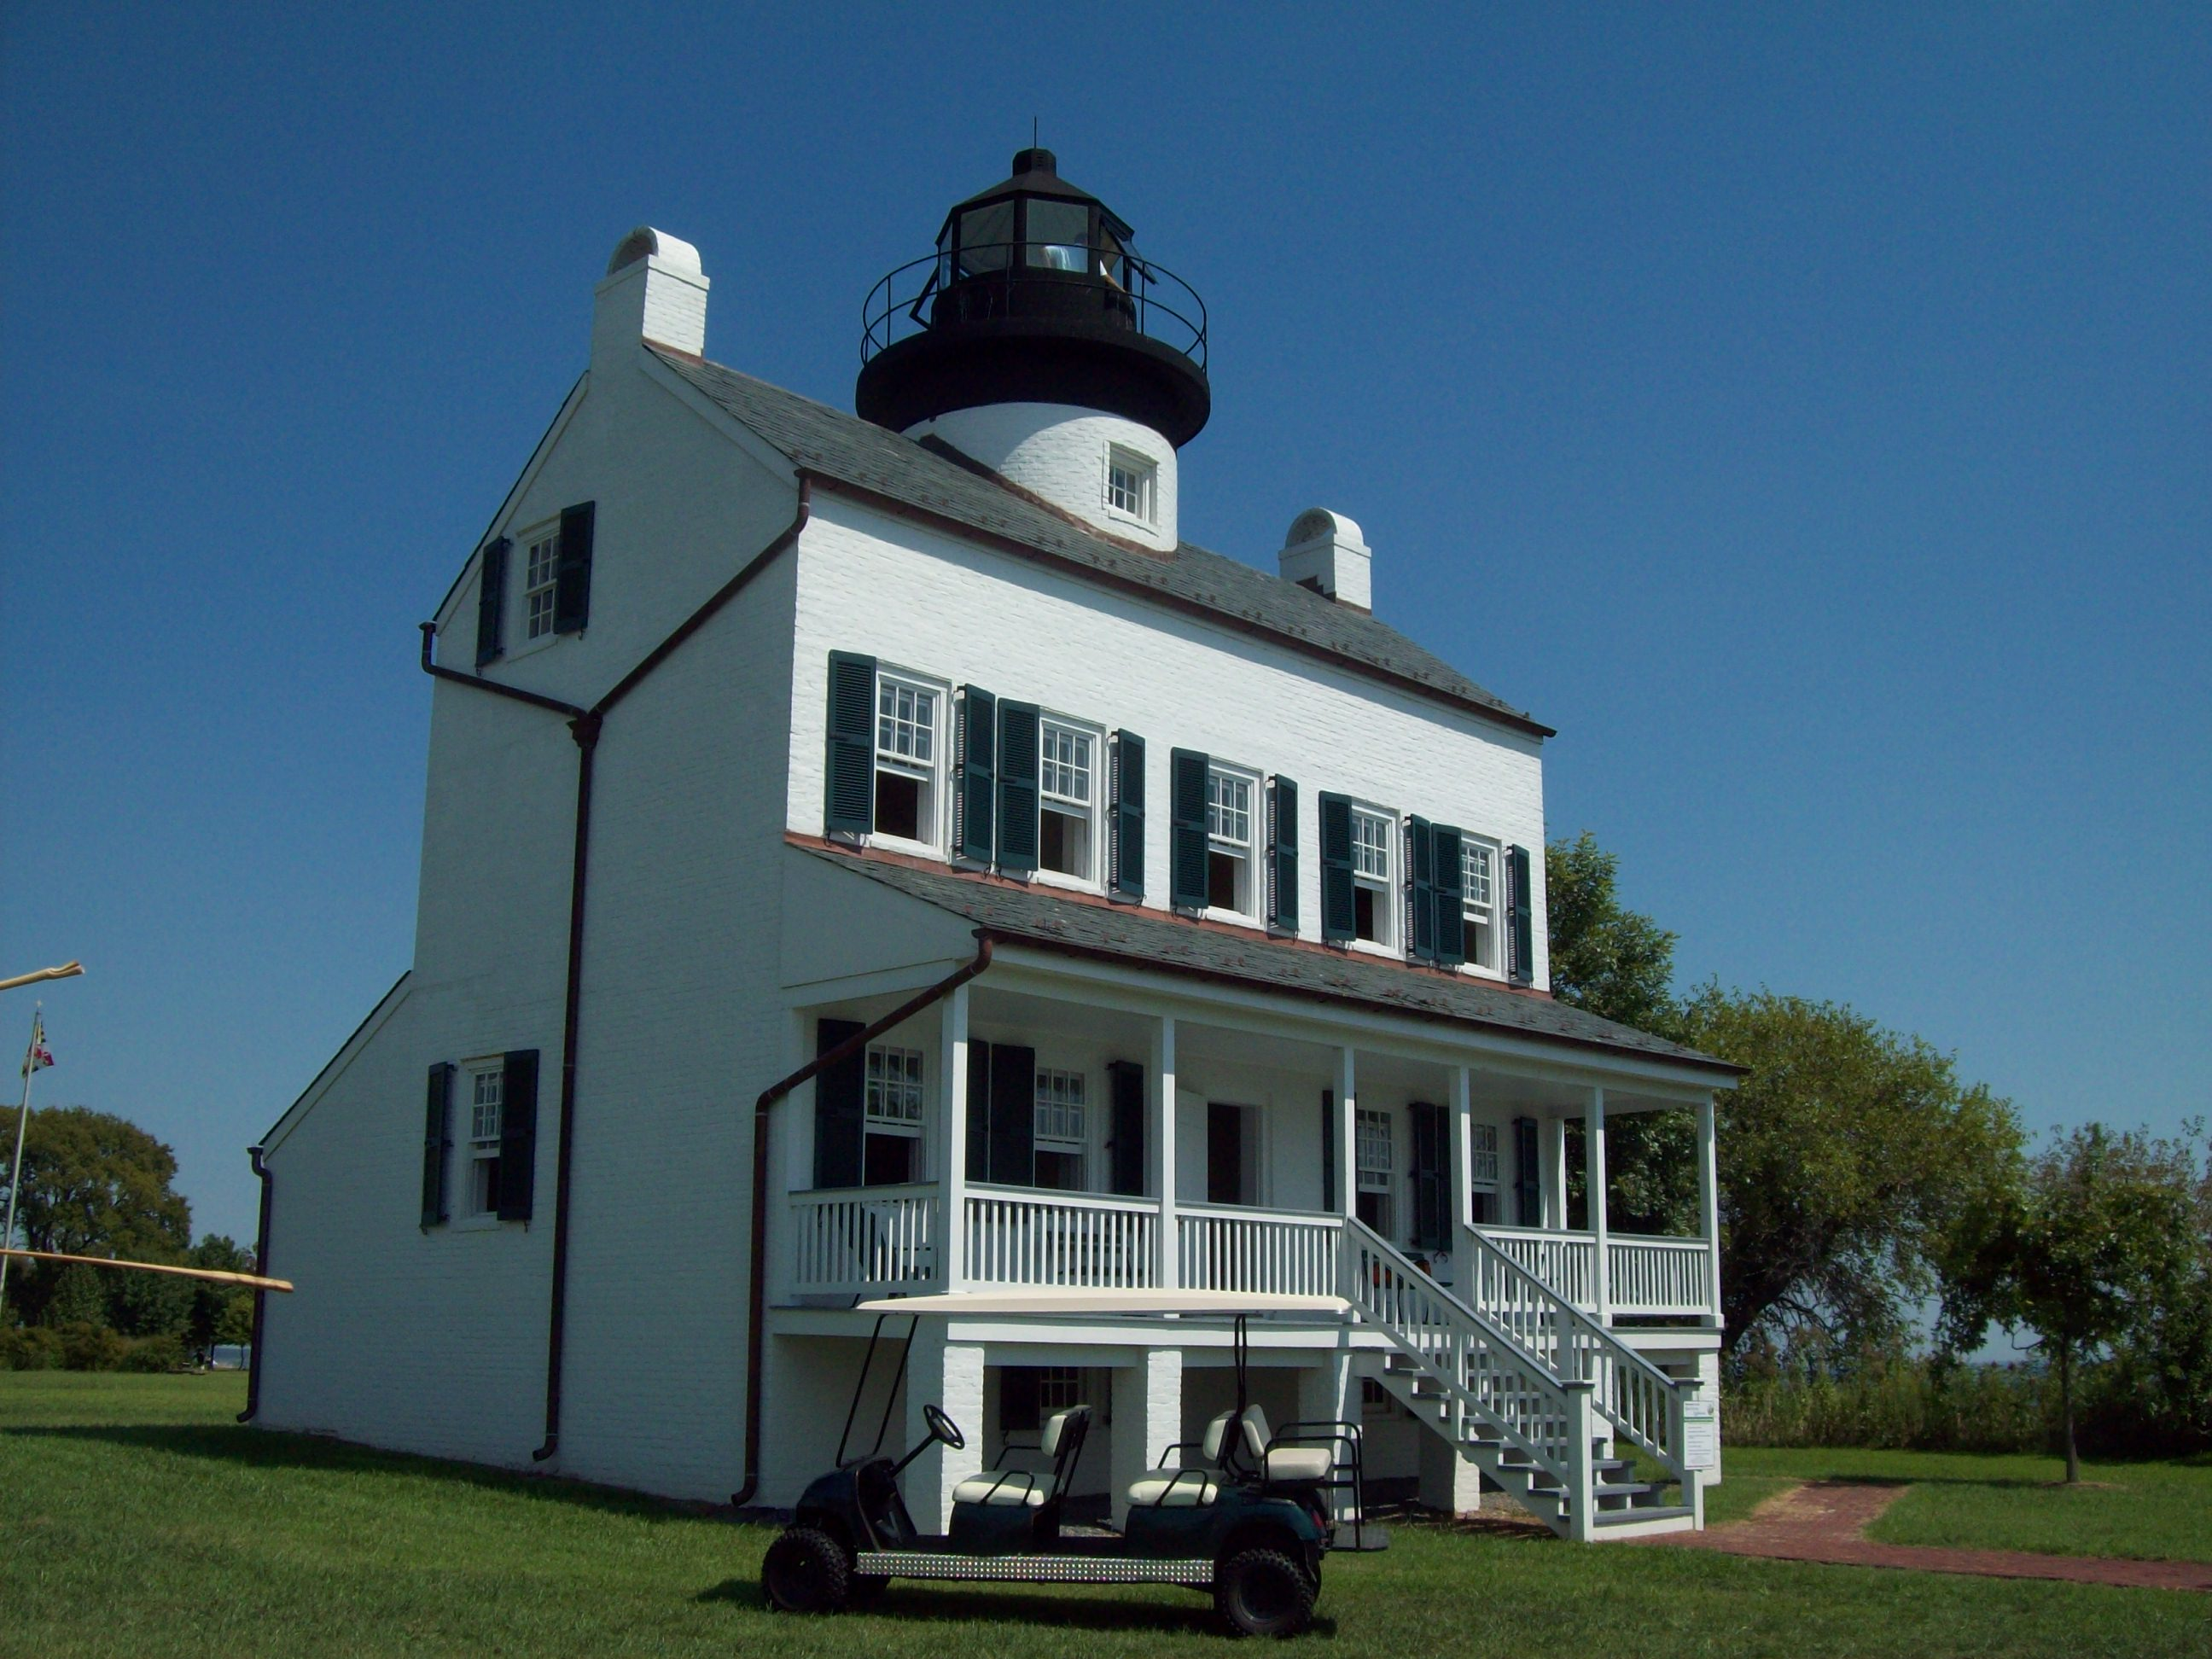 Saint Clements Island State Park